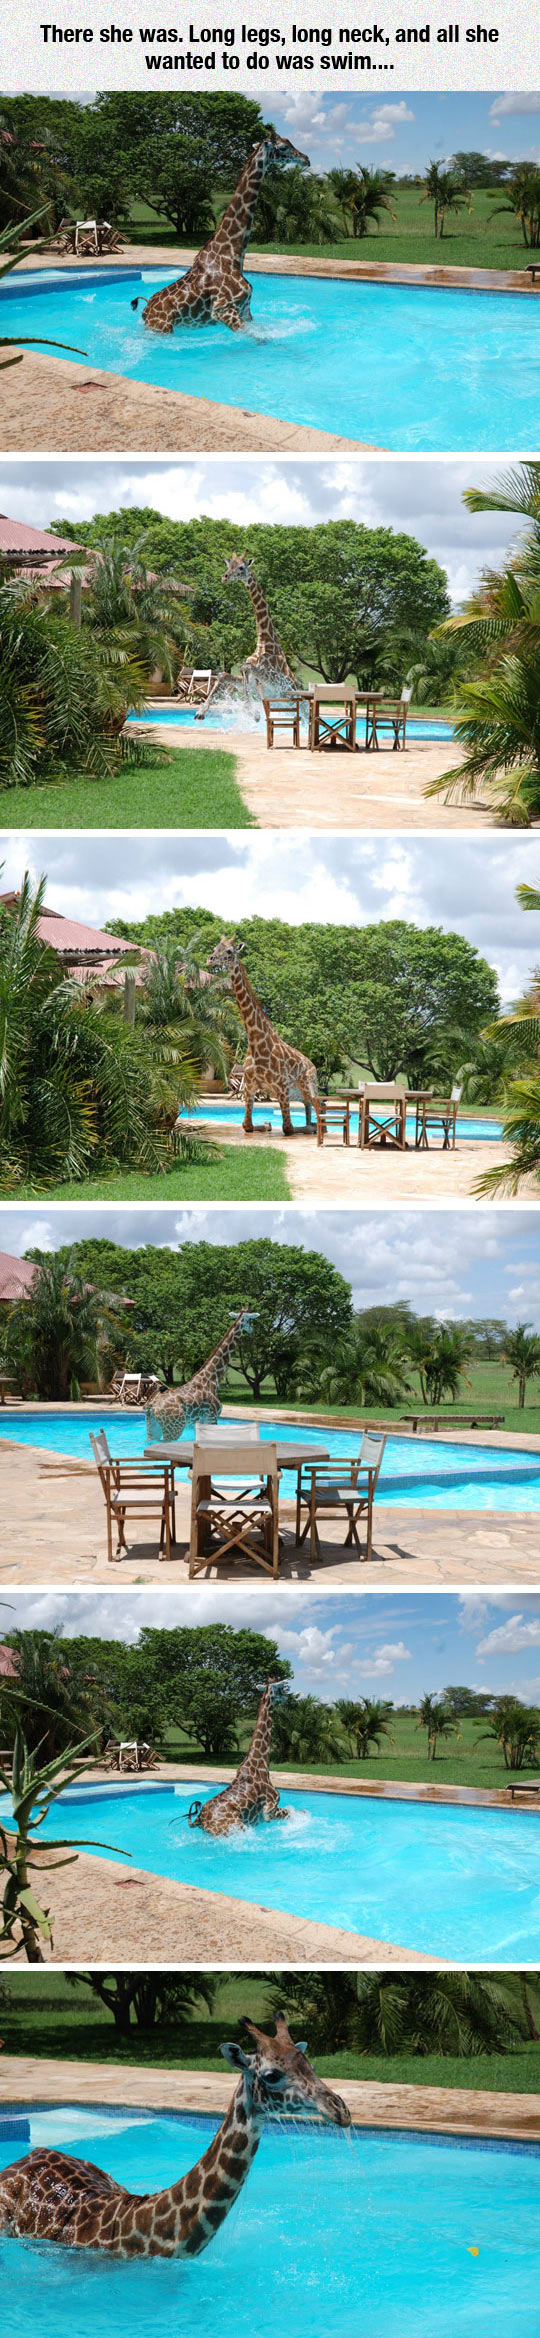 Monduli The Giraffe Takes A Swim